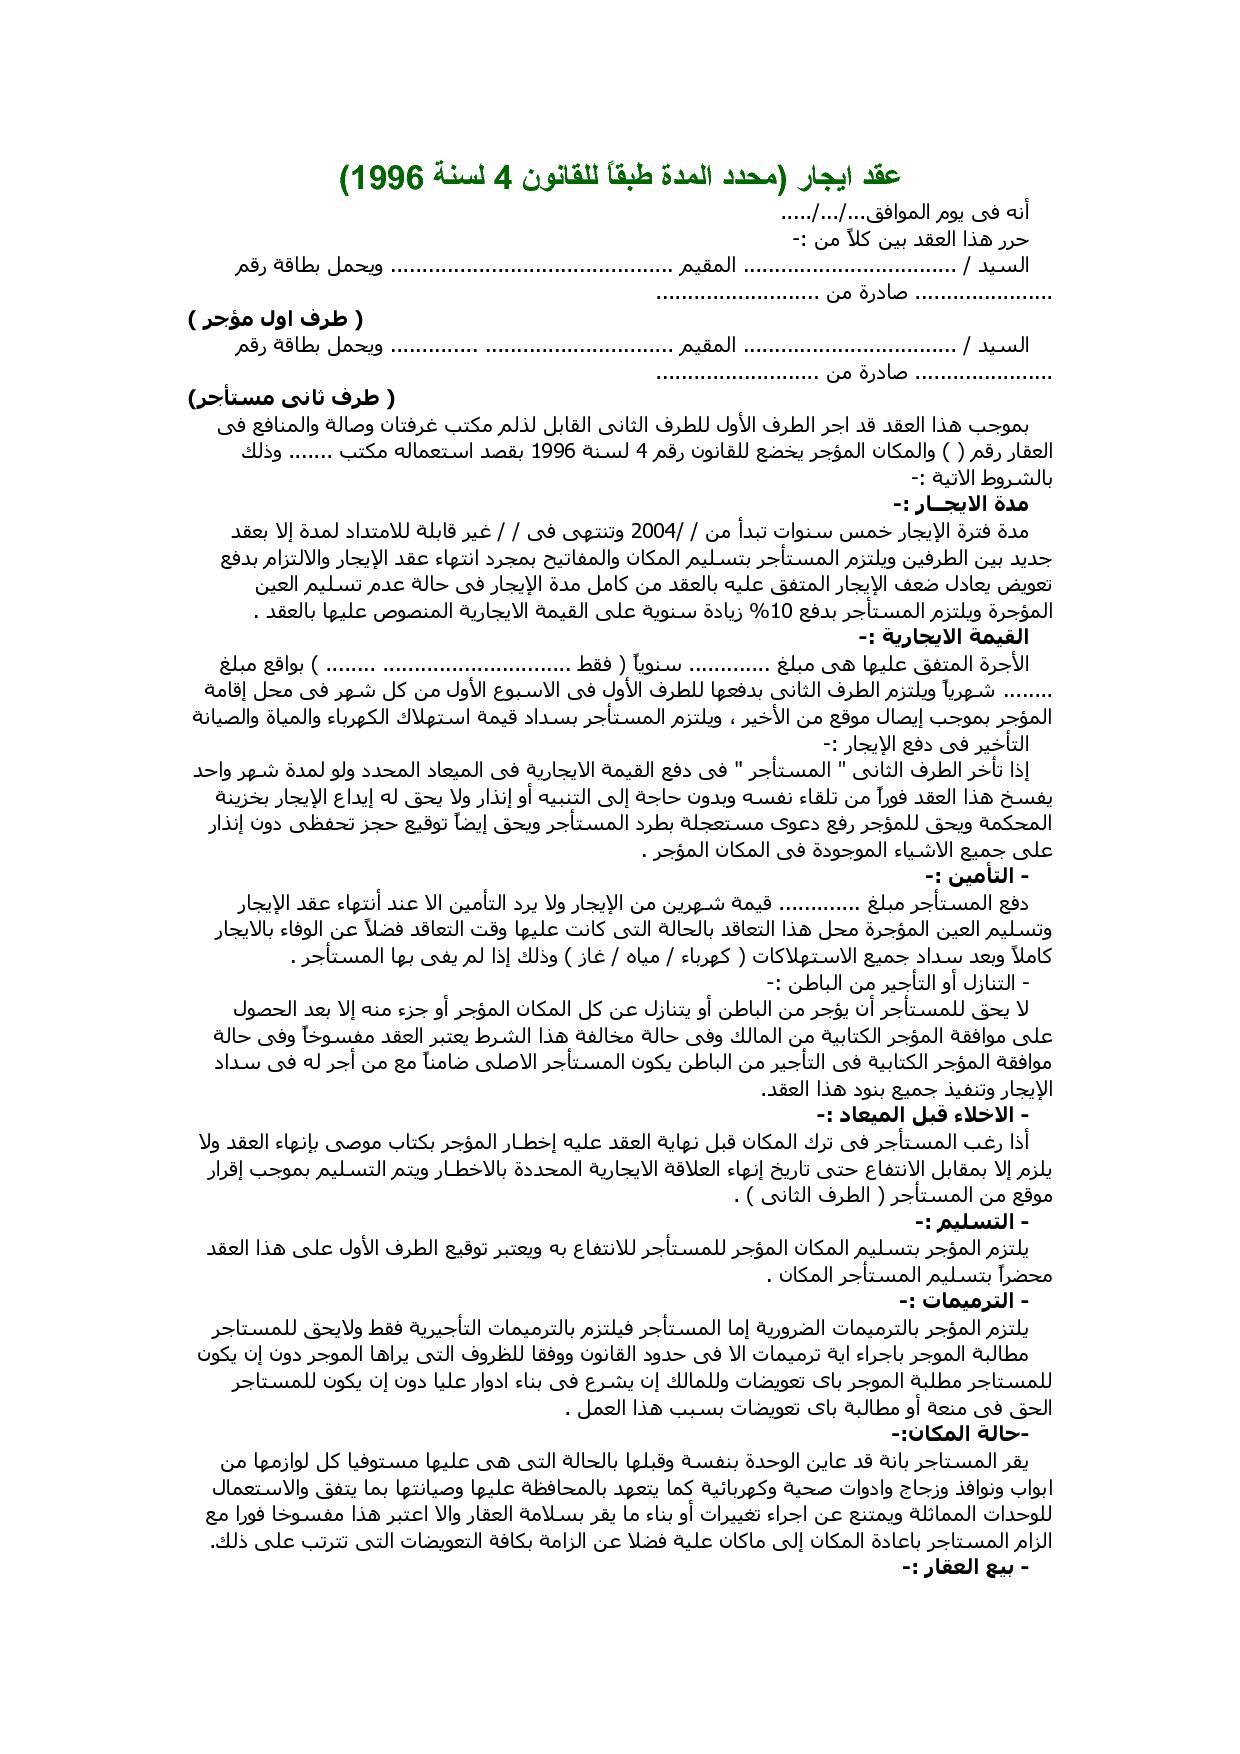 Learning Arabic Milestone 2 The Arabic Learner